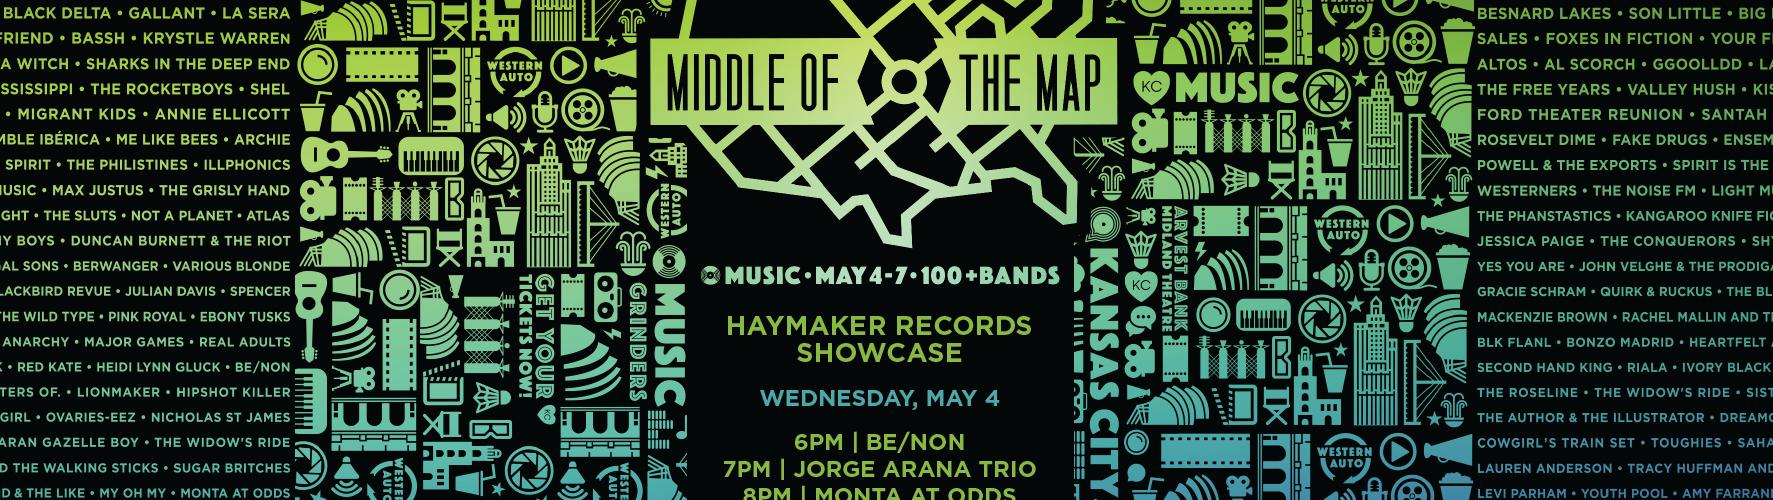 Haymaker Records Showcase MOTM 2016